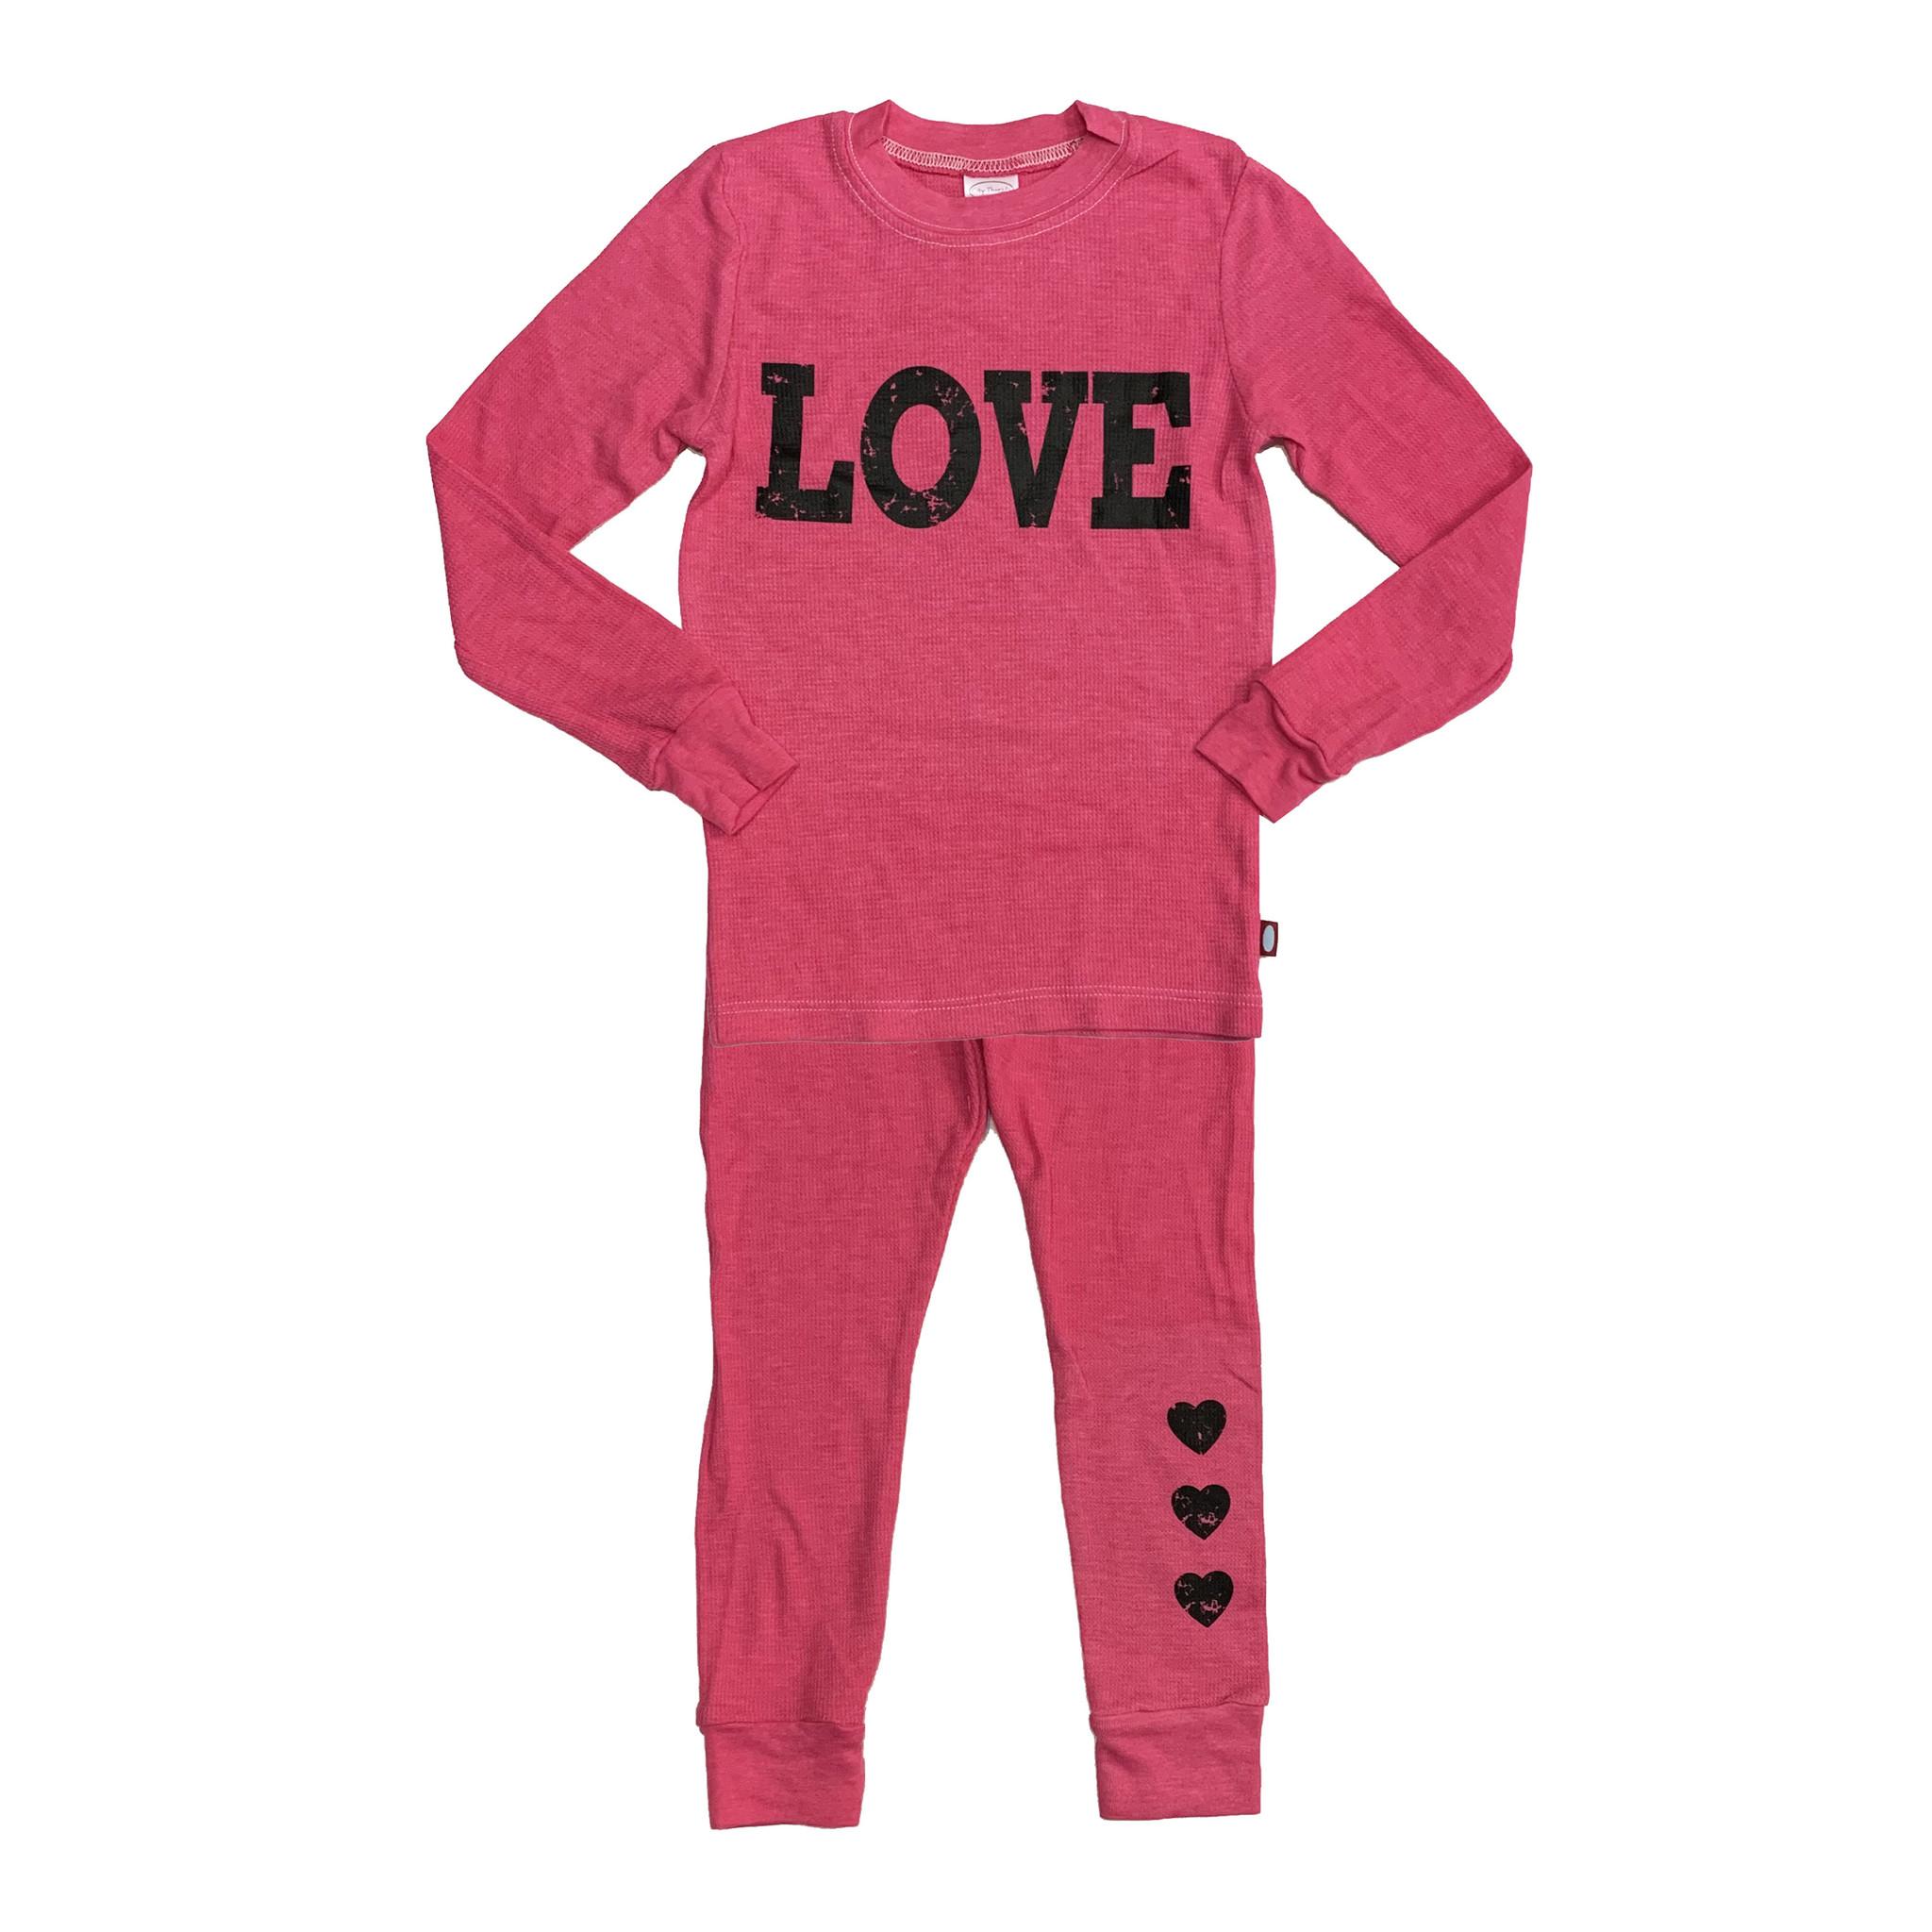 Hot Pink Love Thermal Pajamas